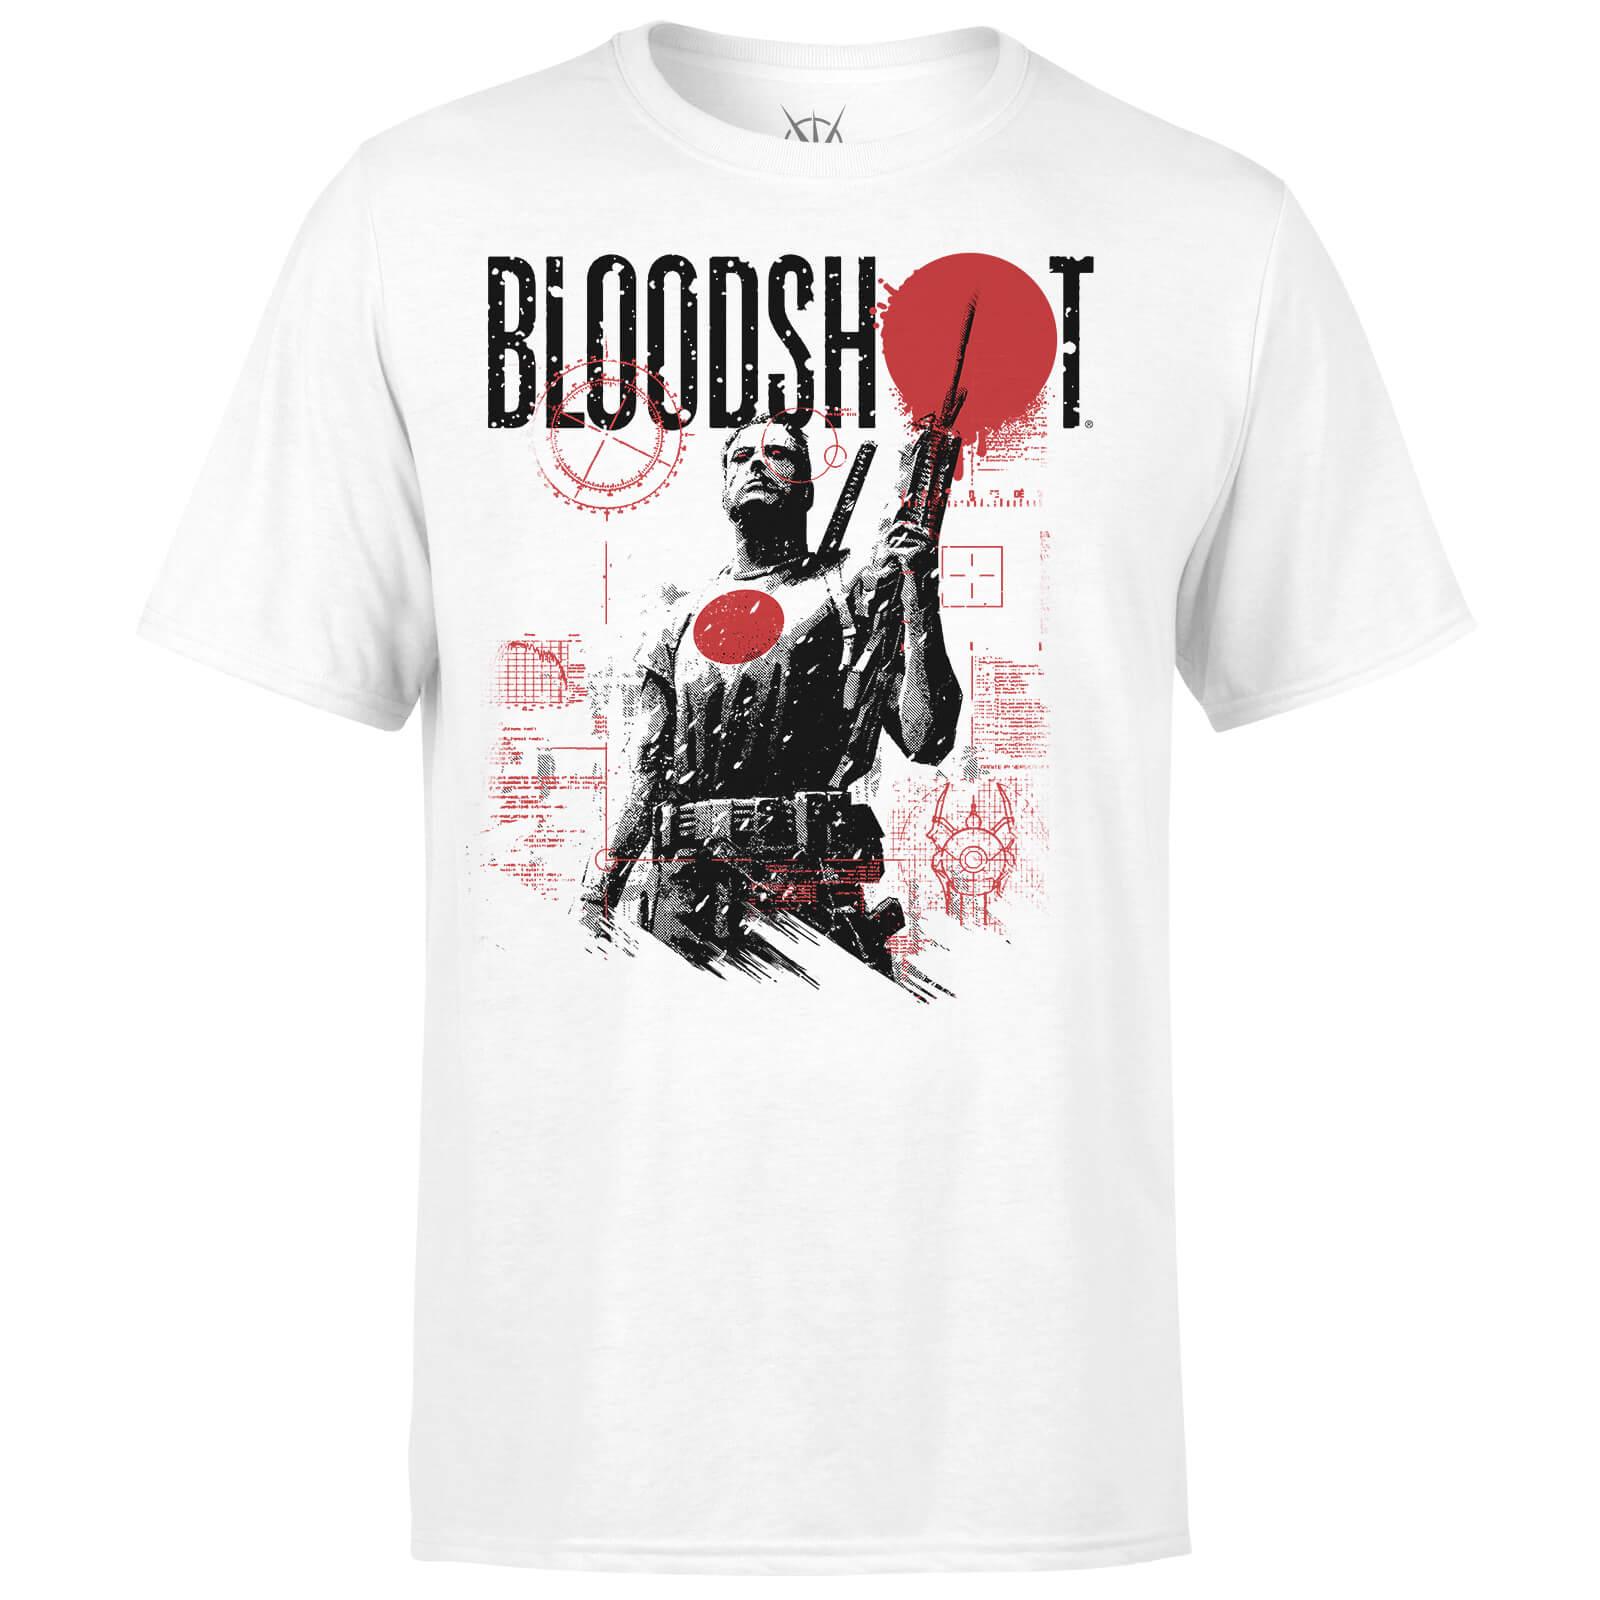 c6b08afeb844 White T Shirts With Graphics   CDJLFH Women Short Sleeve Graphic ...